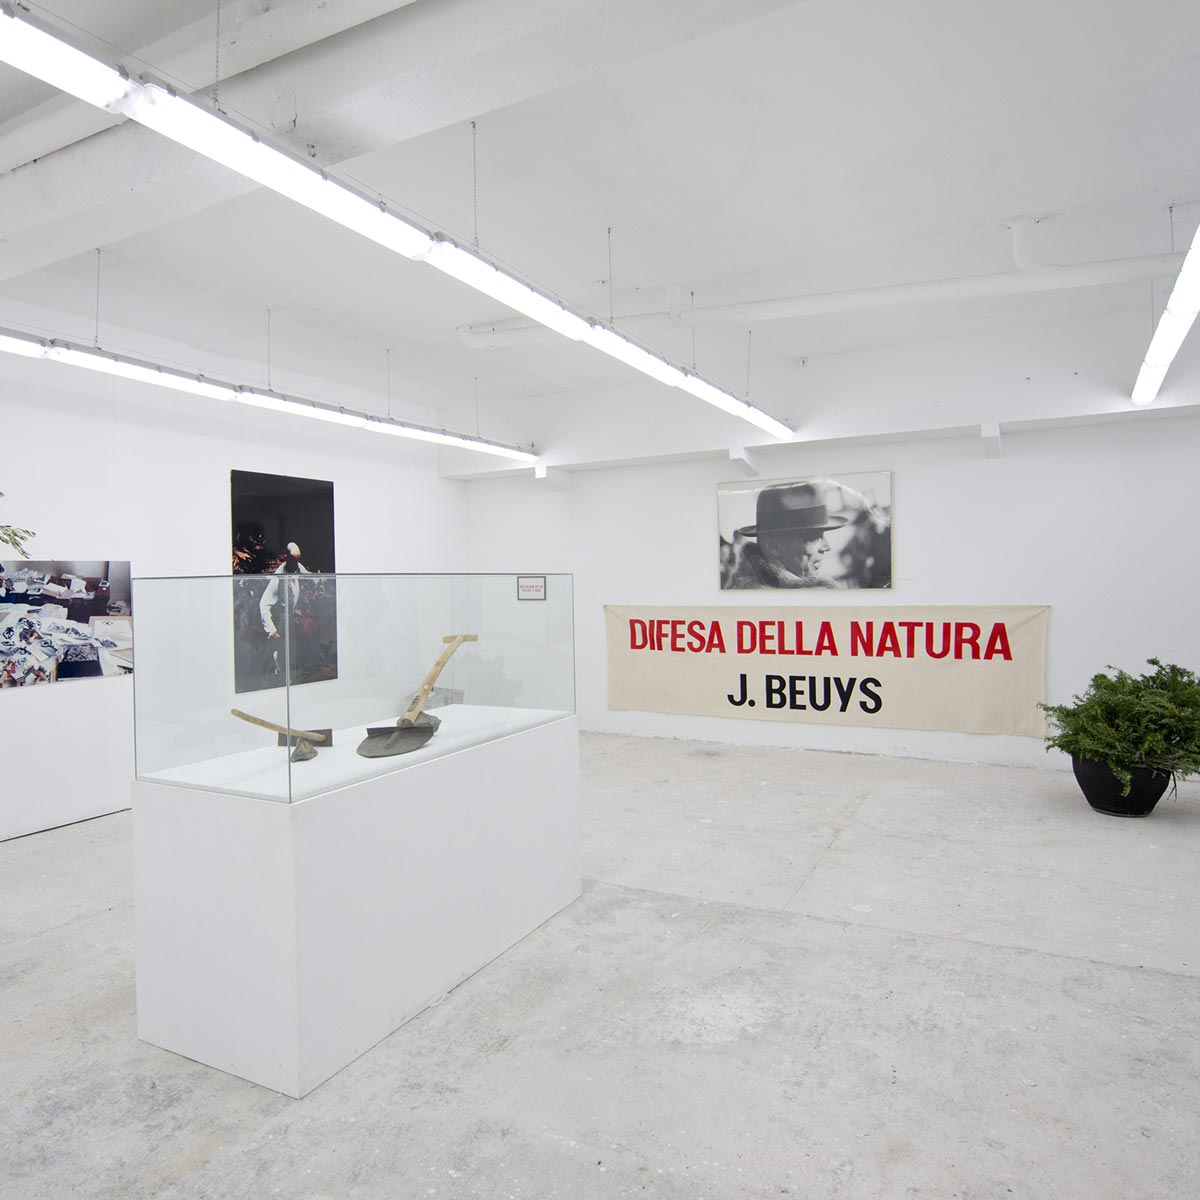 Difesa-della-Natura_J-Beuys